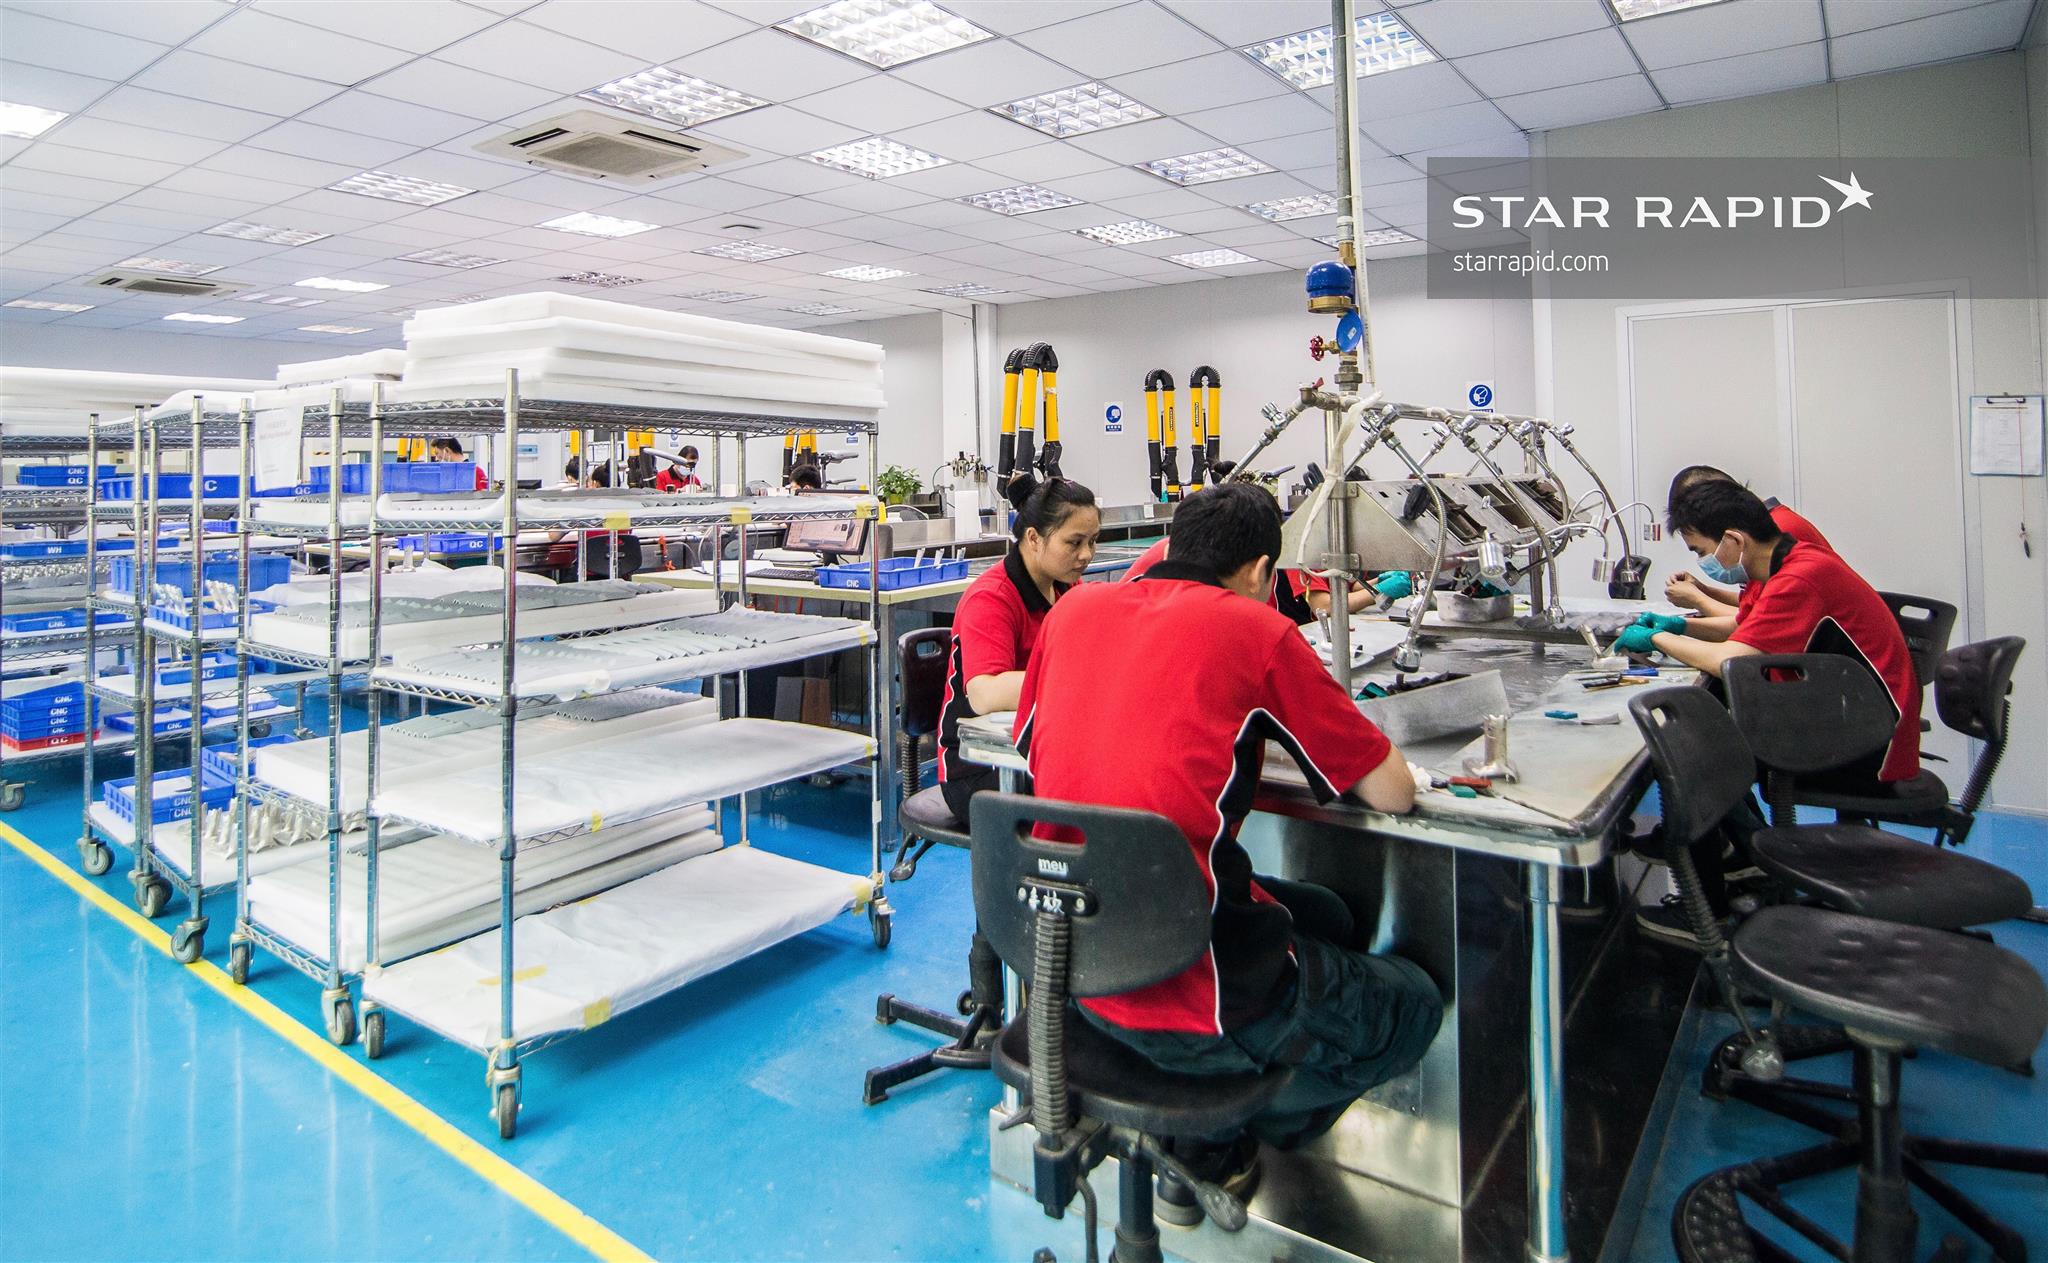 Model finishing shop at Star Rapid